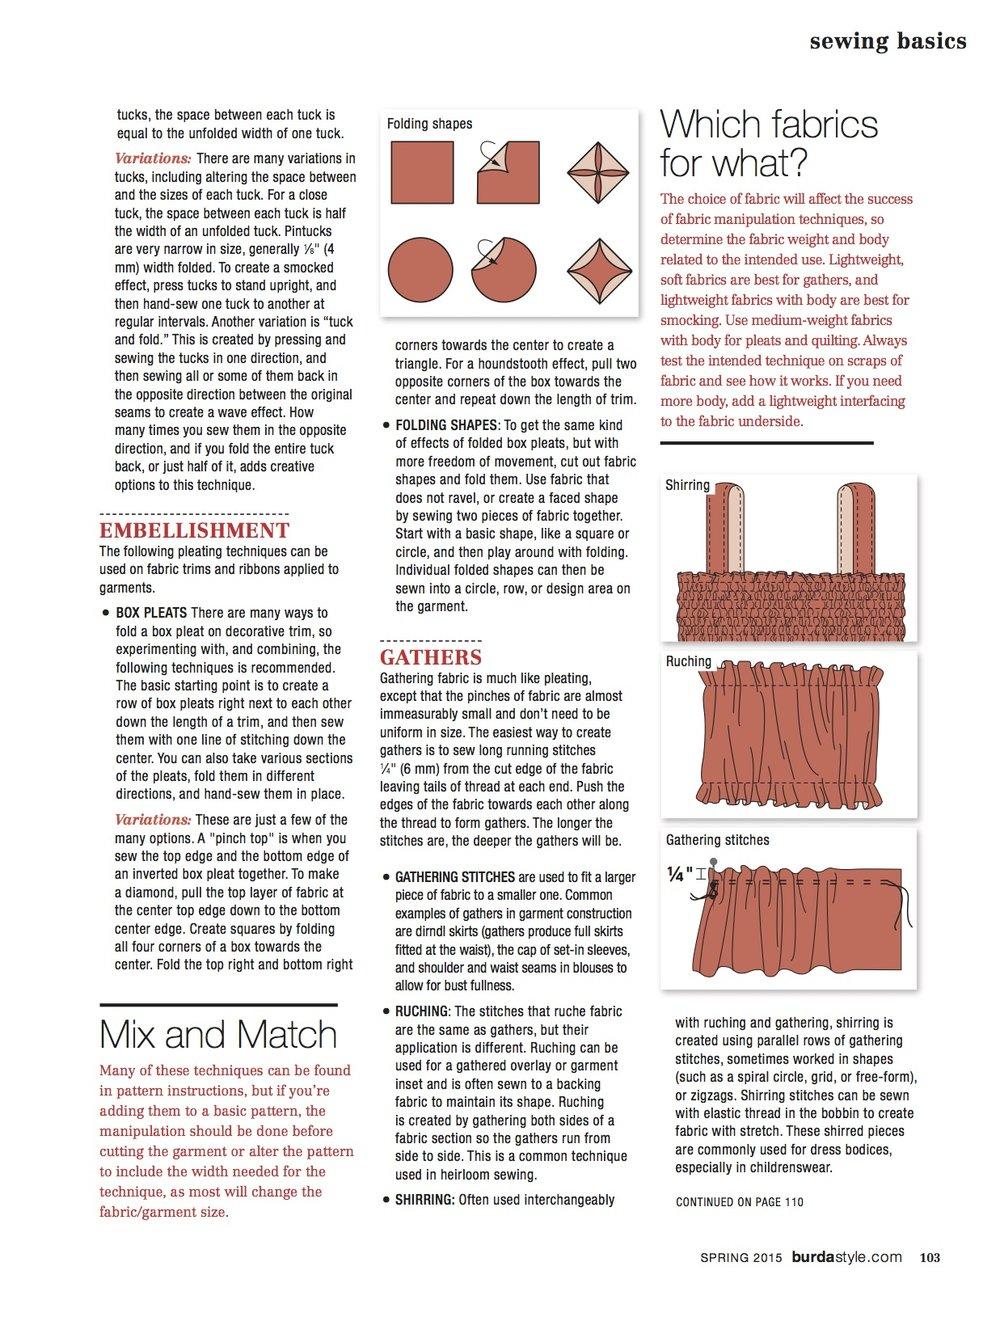 Sewing_Basics_Spring2015_Amanda_Kaufmann2.jpg